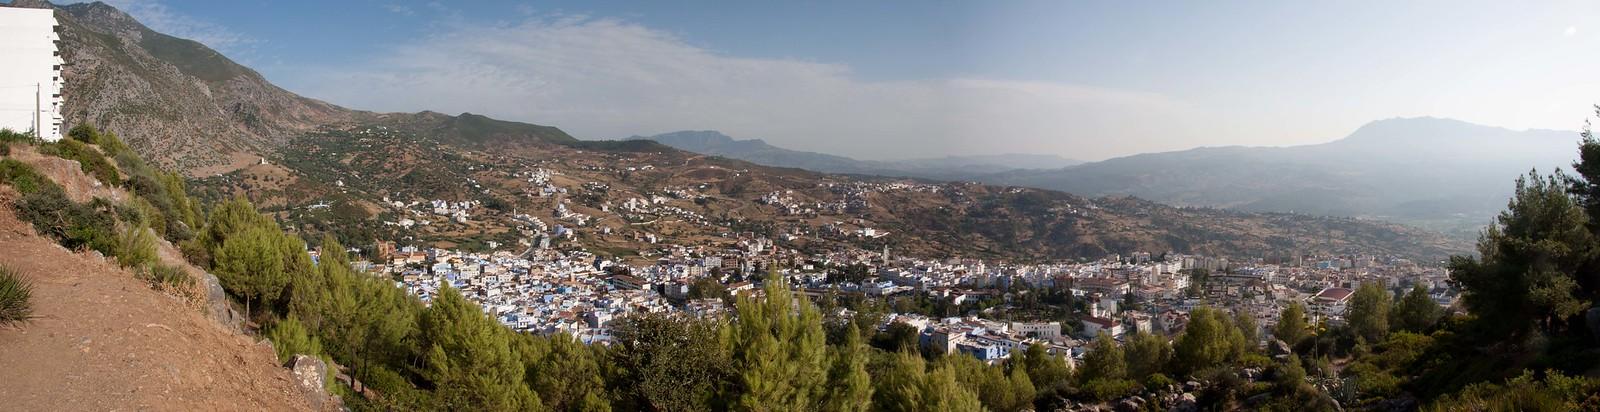 Marokko 2015-07_070p